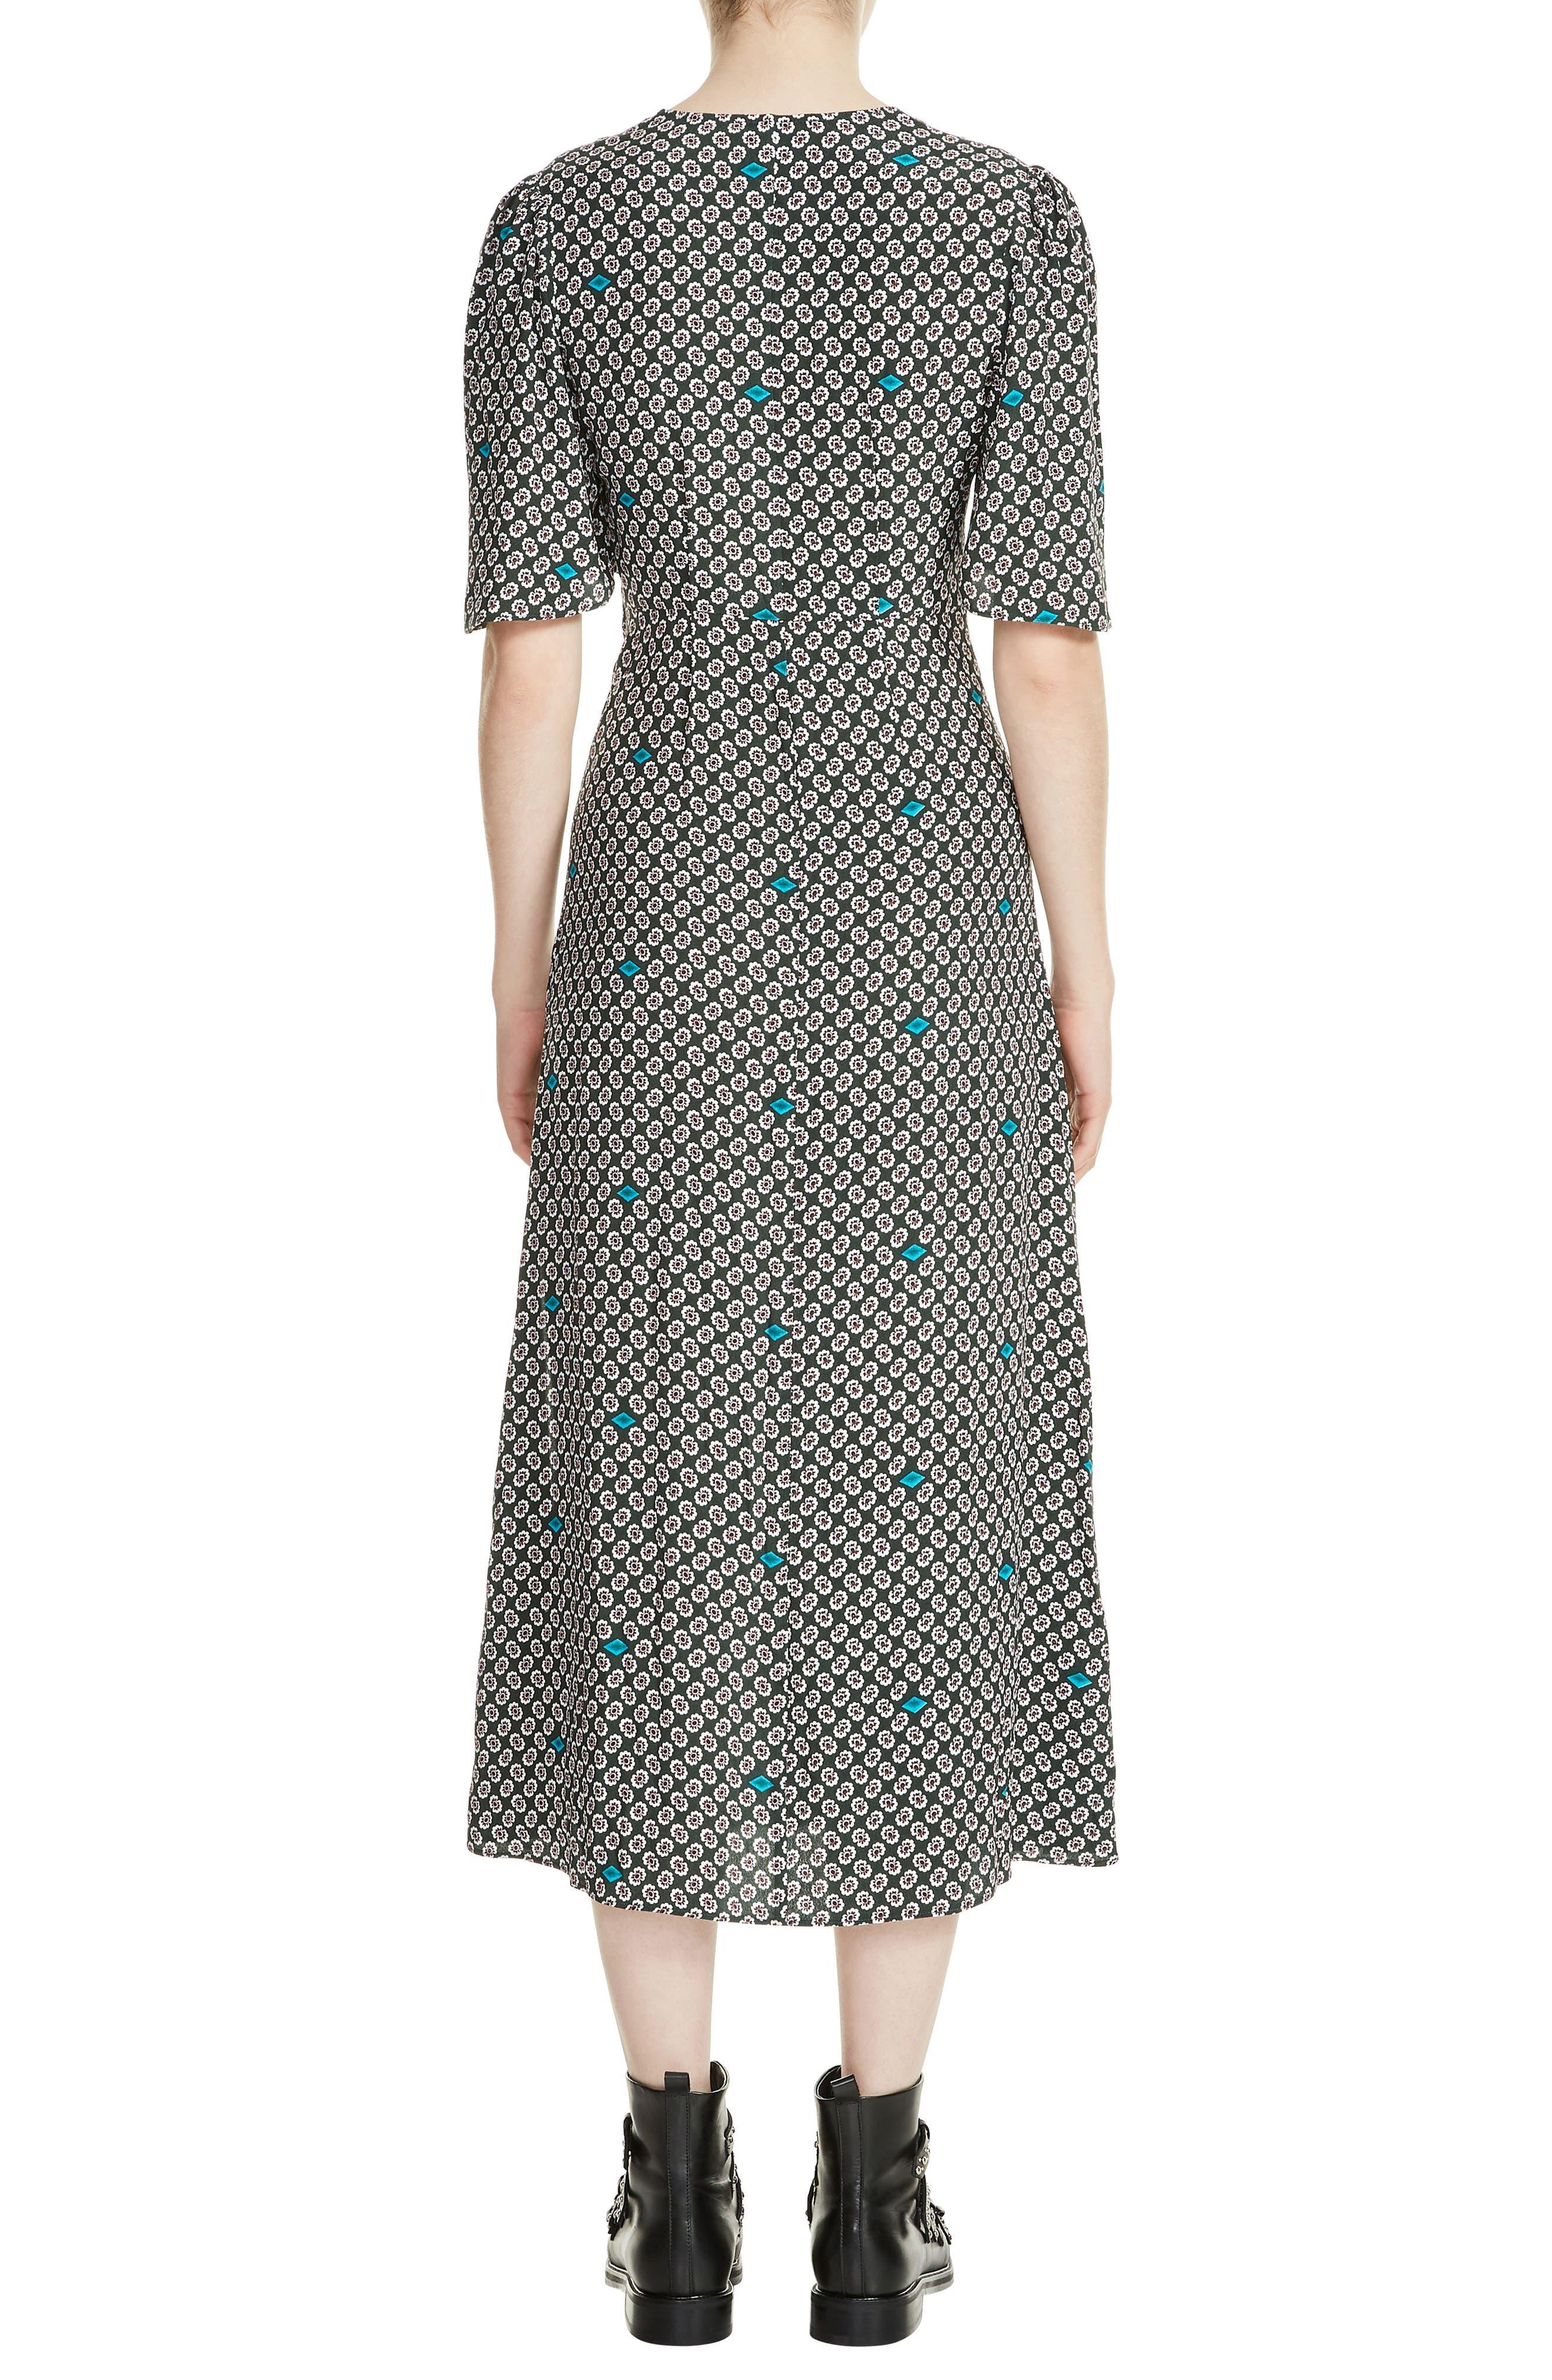 Renoua Print Midi Dress,                             Alternate thumbnail 2, color,                             Printed